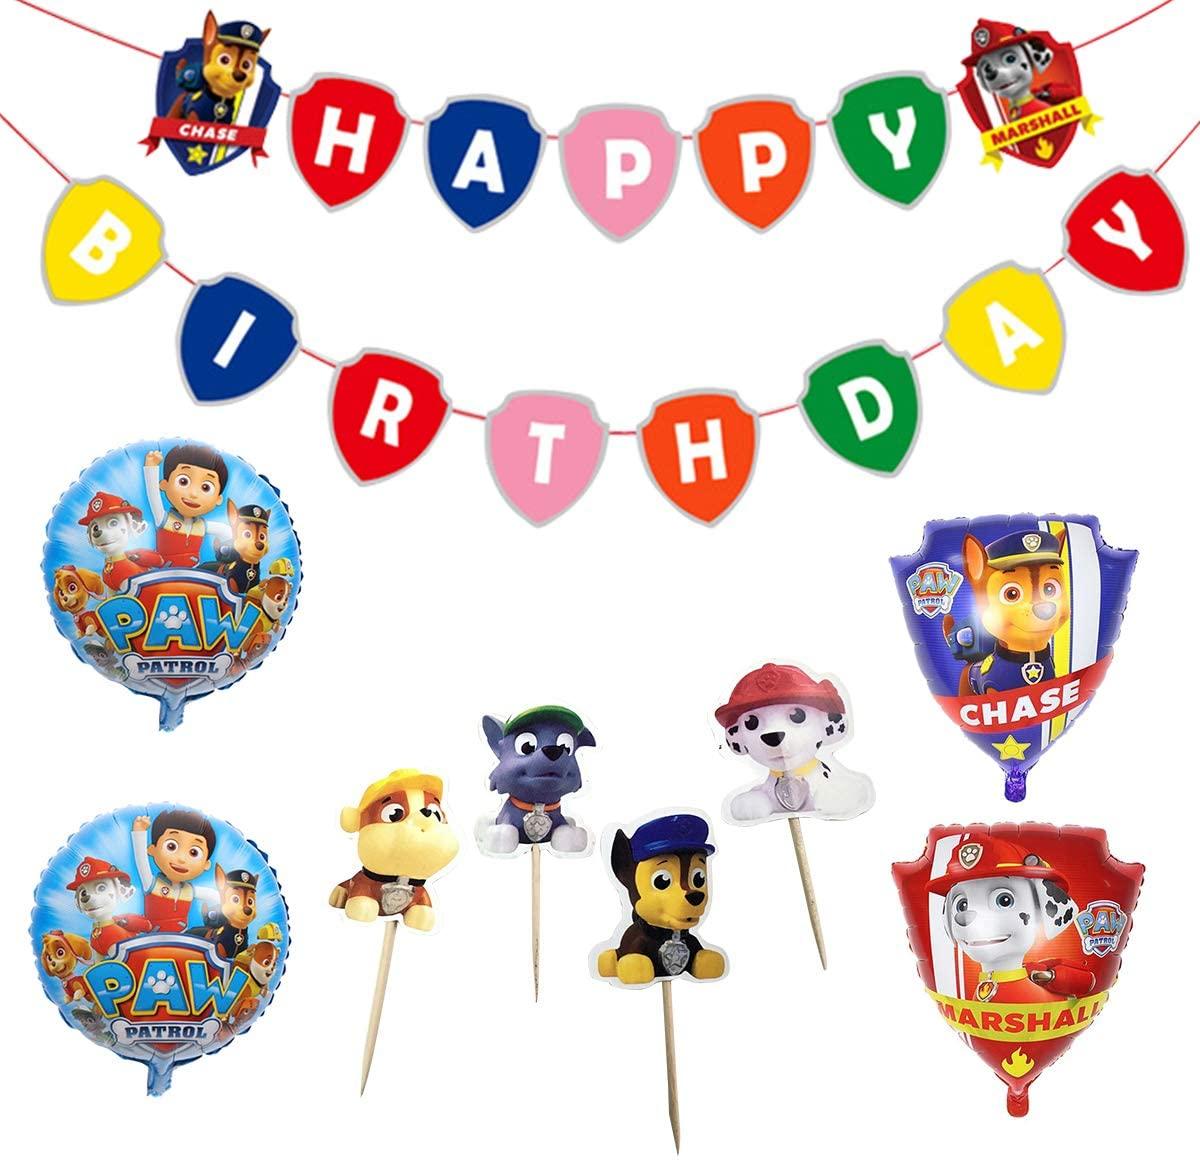 paw patrol birthday decoration party set supplies boys kids cute dog happy birthday banner garland balloon cake topper 29 pieces set